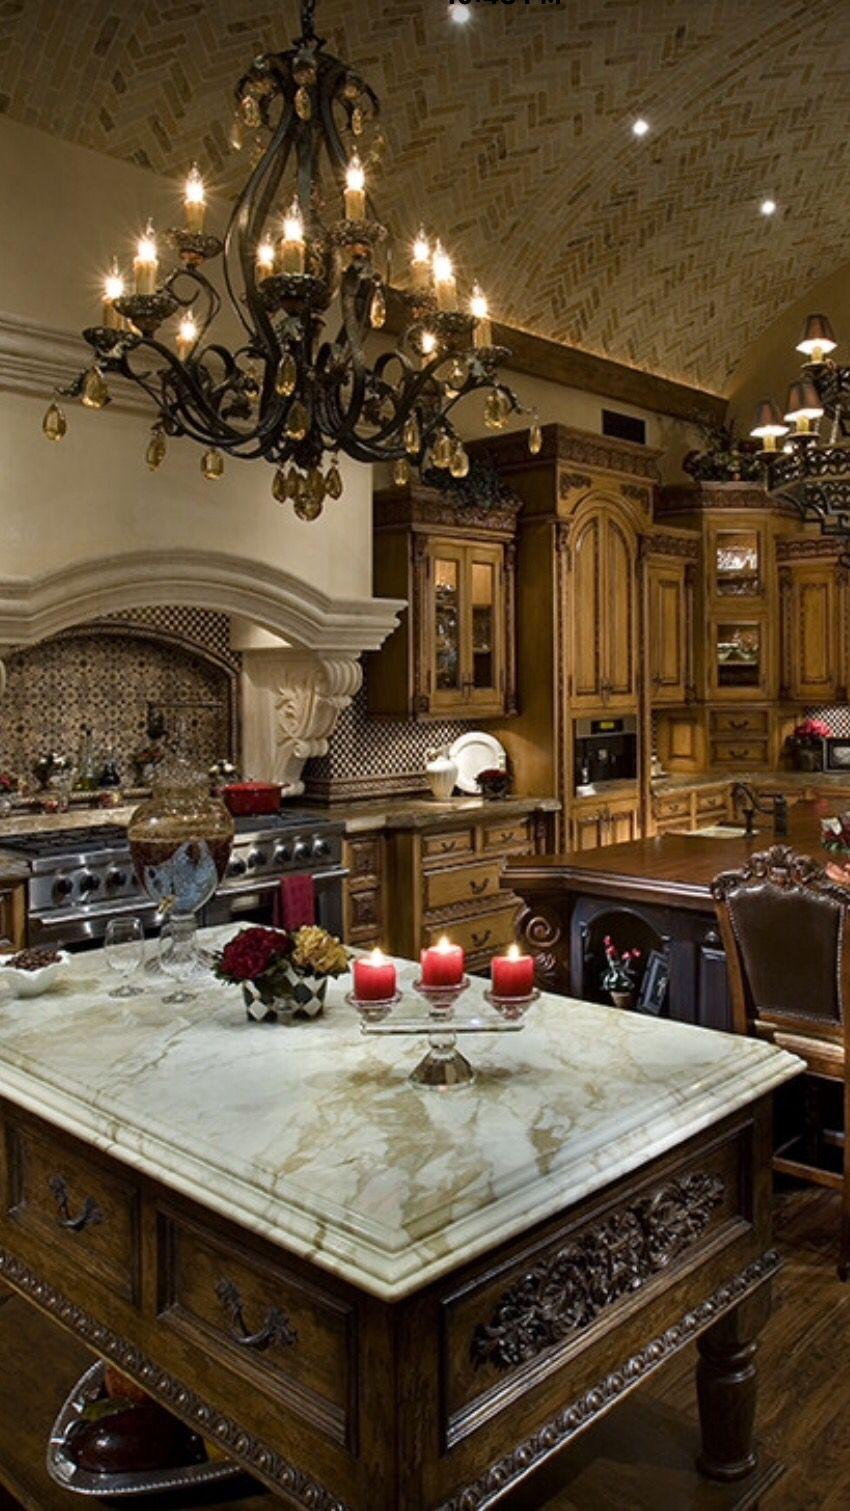 luxury interior design via houzz luxurydotcom kitchens with images luxury kitchens on kitchen interior luxury id=32197